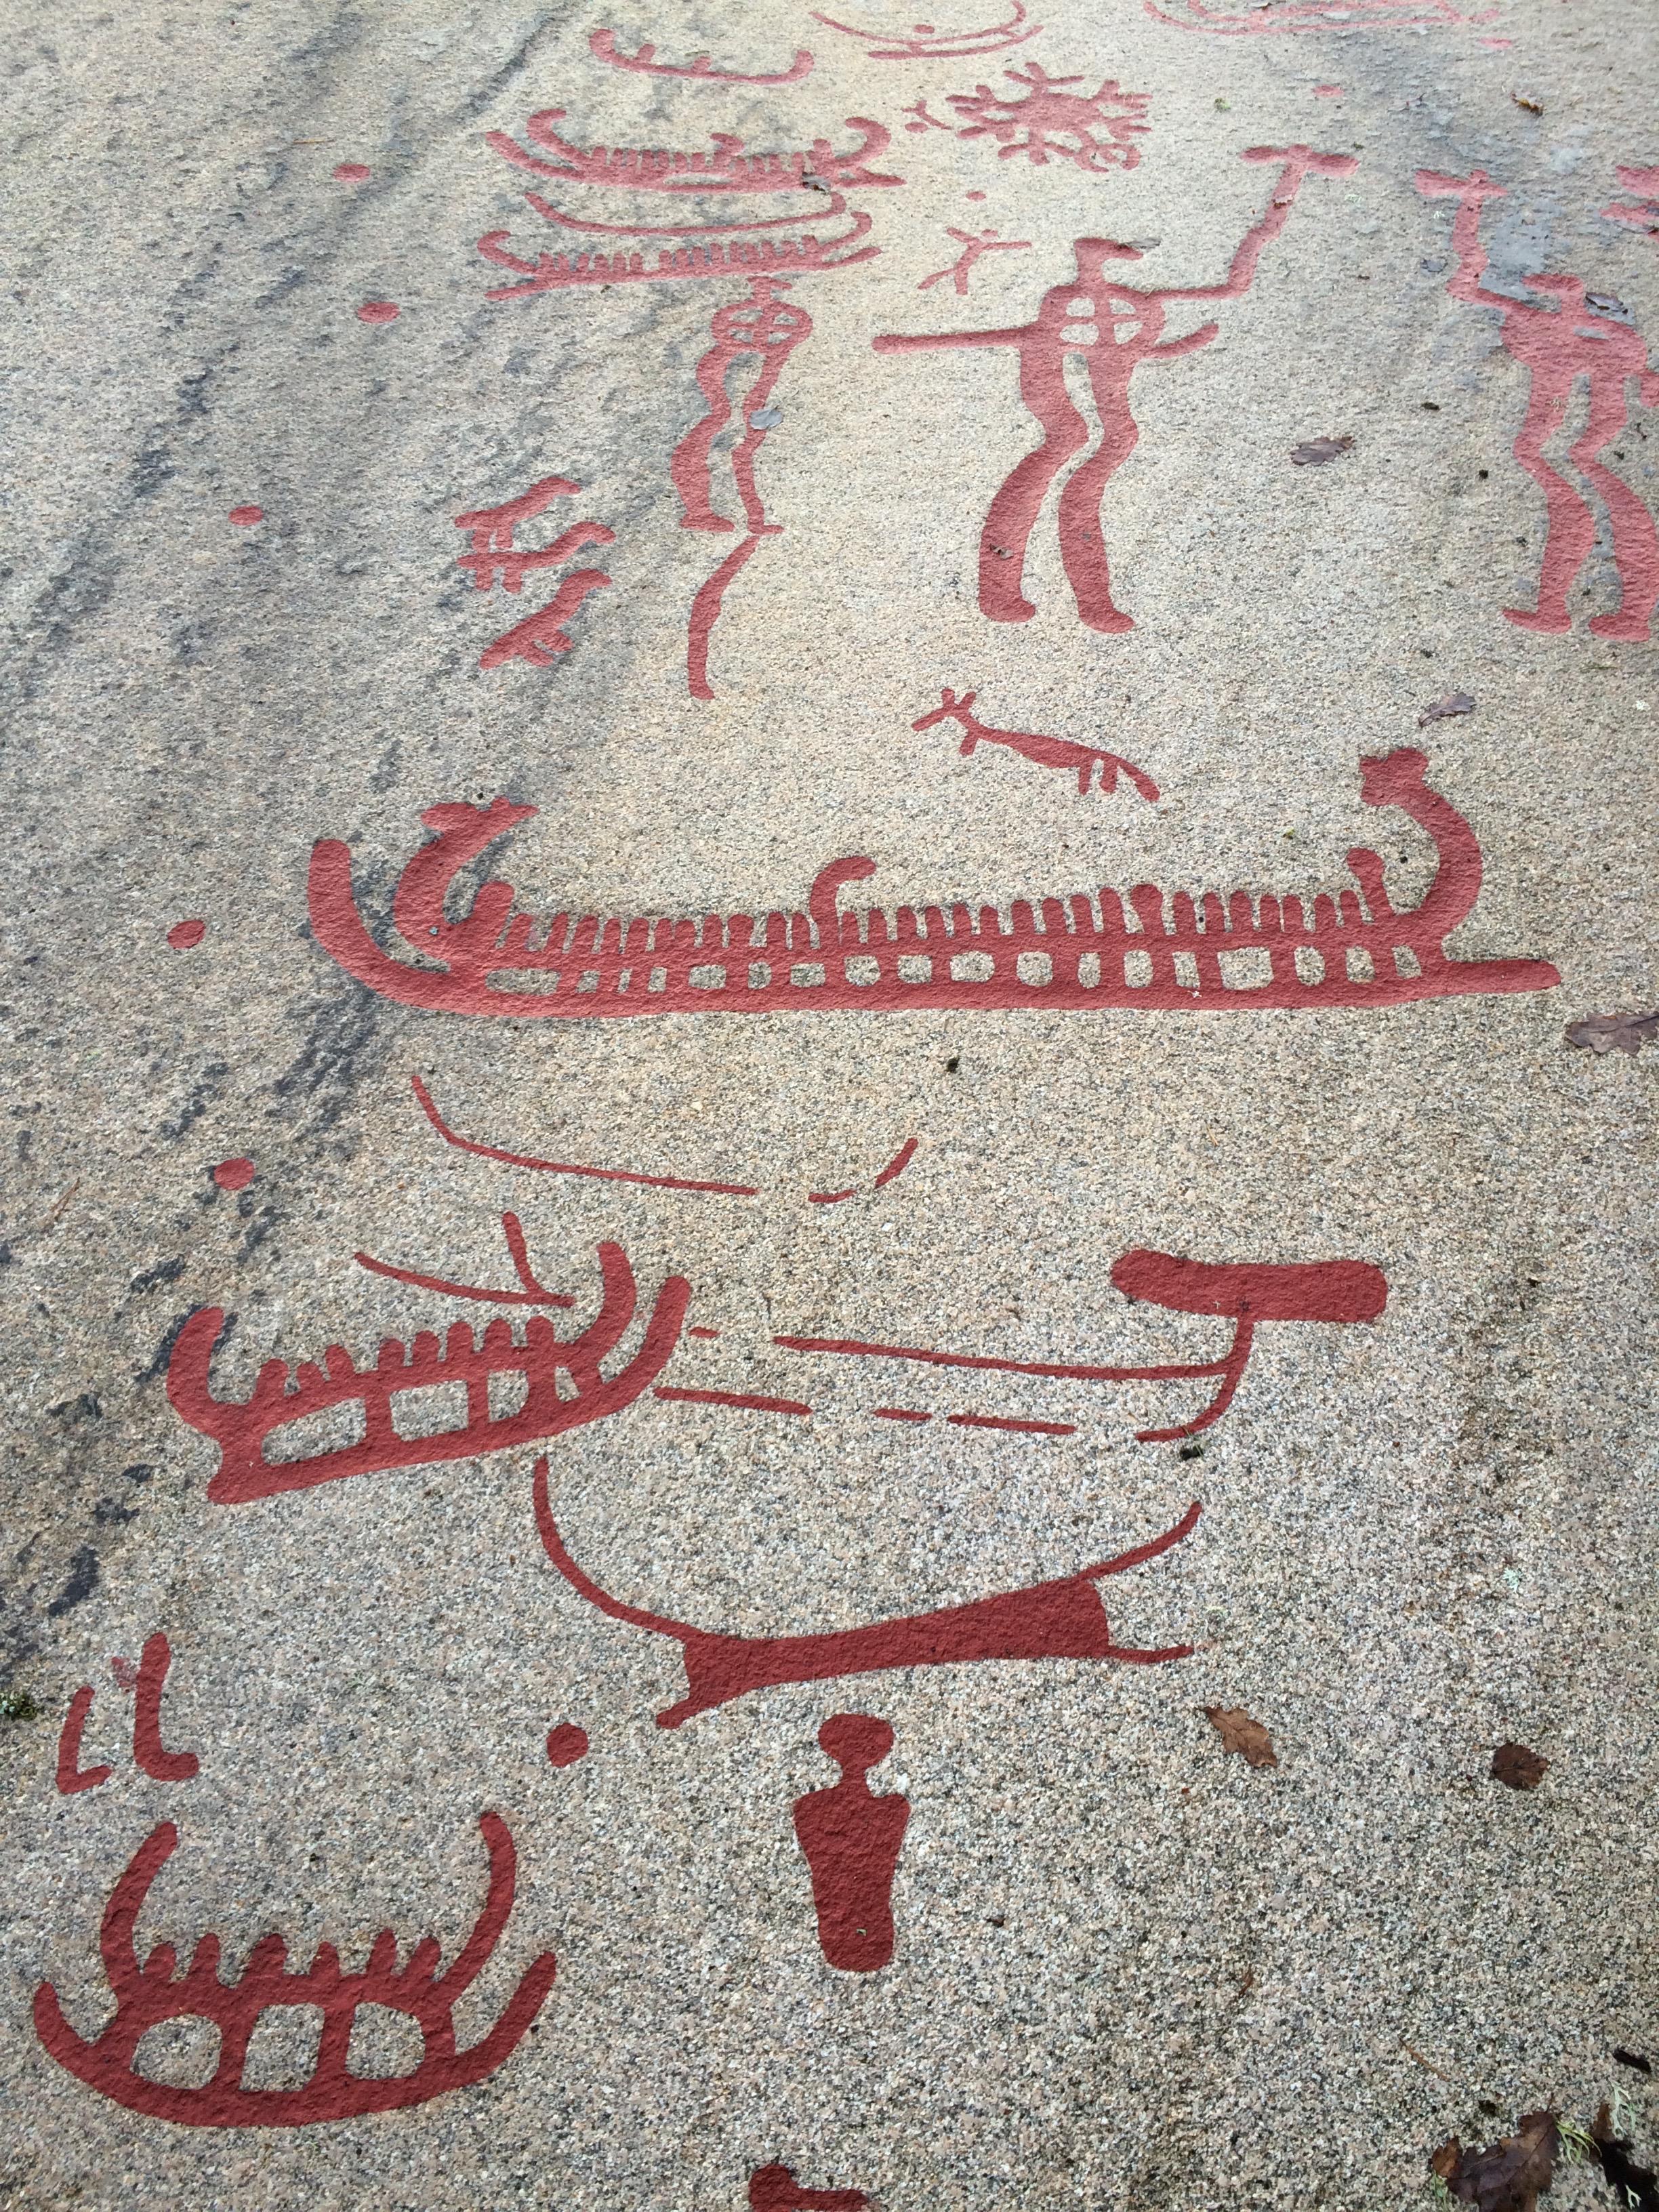 Konstlistancom rock carvings art petroglyph scandinavia